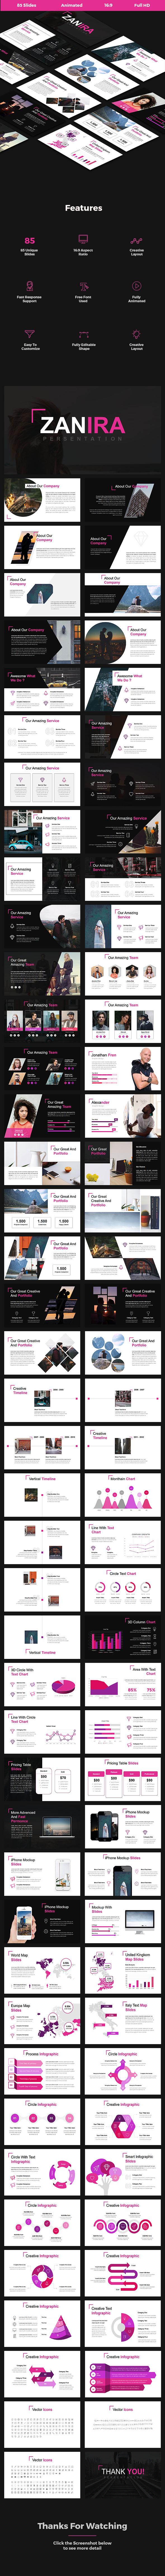 Zanira - Creative Powerpoint Template - Creative PowerPoint Templates